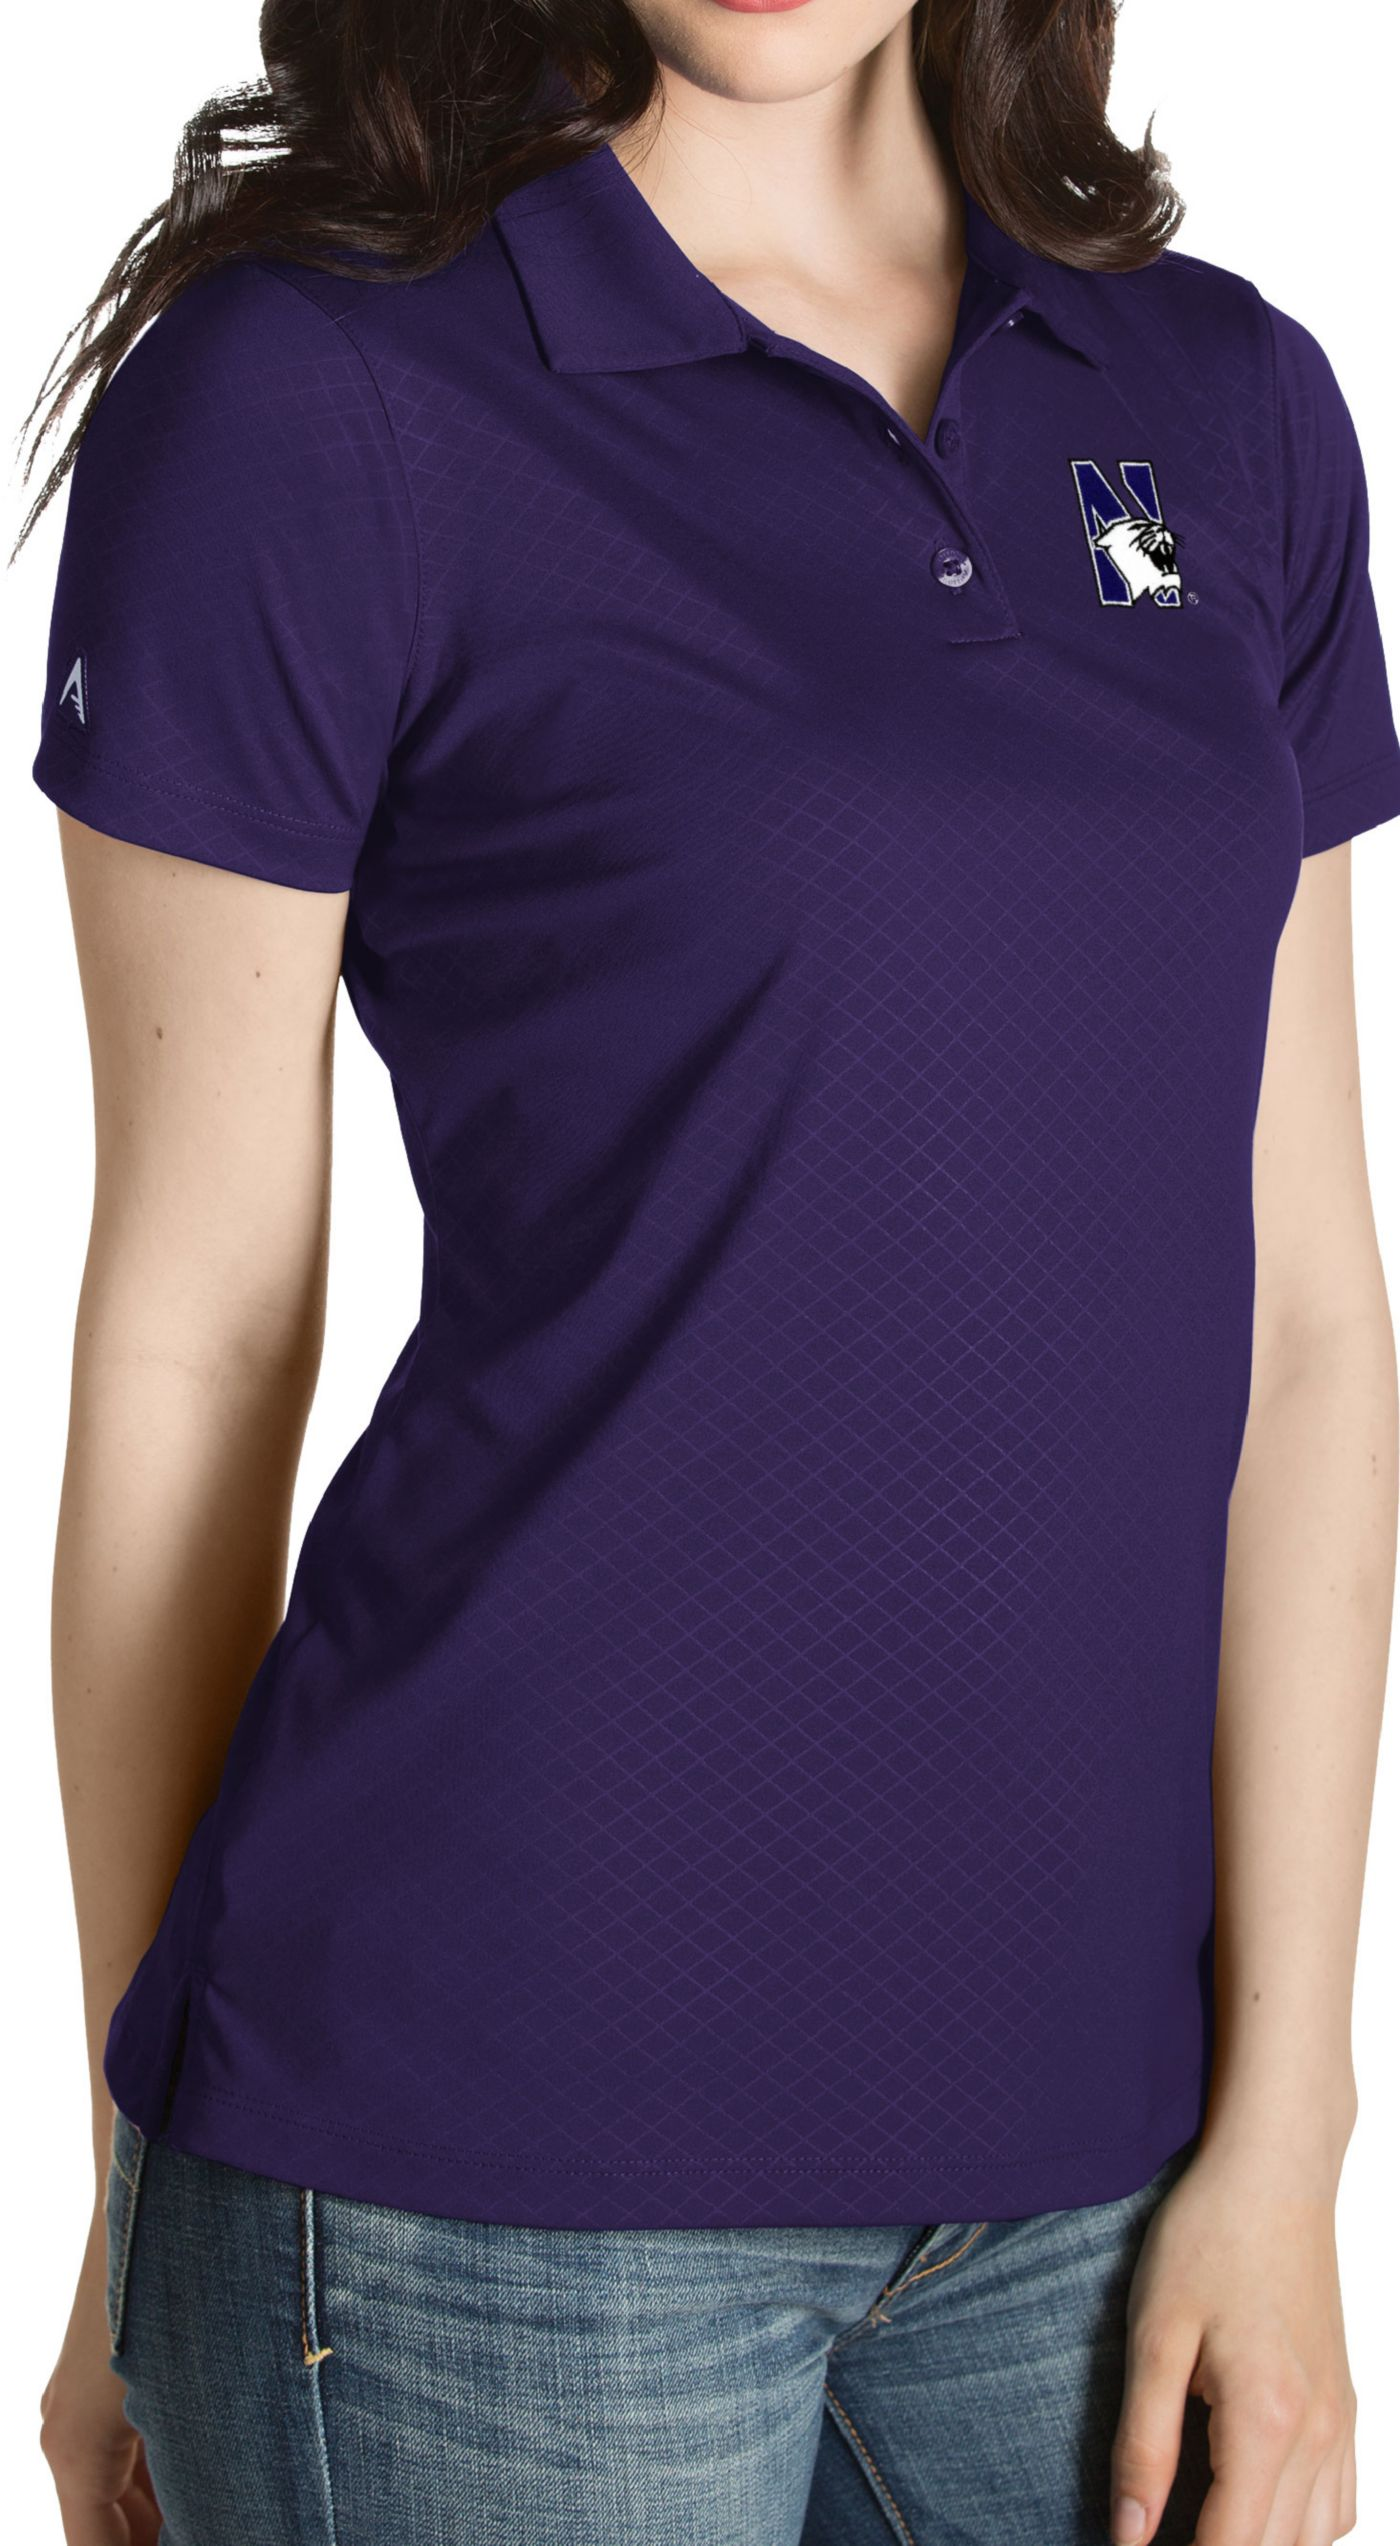 Antigua Women's Northwestern Wildcats Purple Inspire Performance Polo